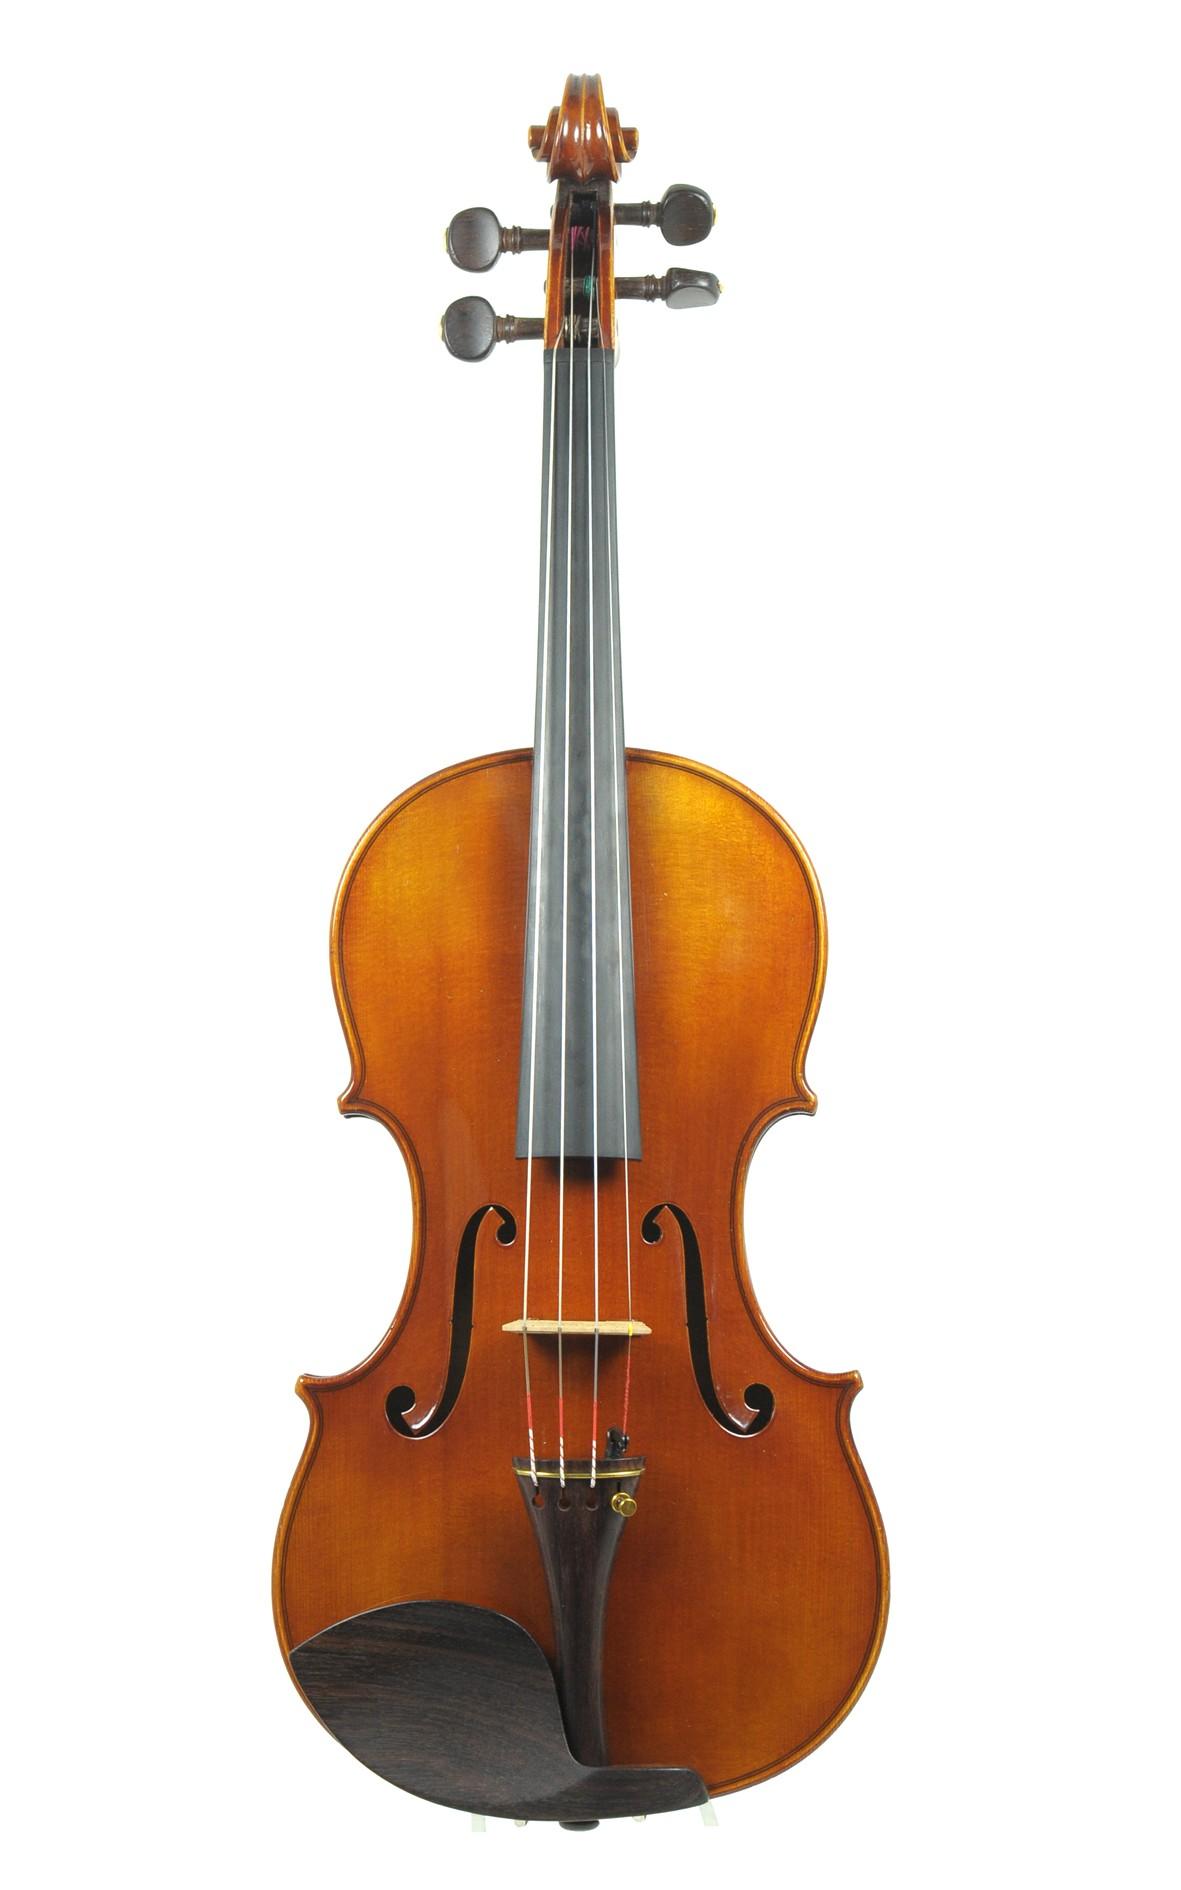 Mirecourt: violin by G. Jamies & G. Meyer in 1929, No. 33